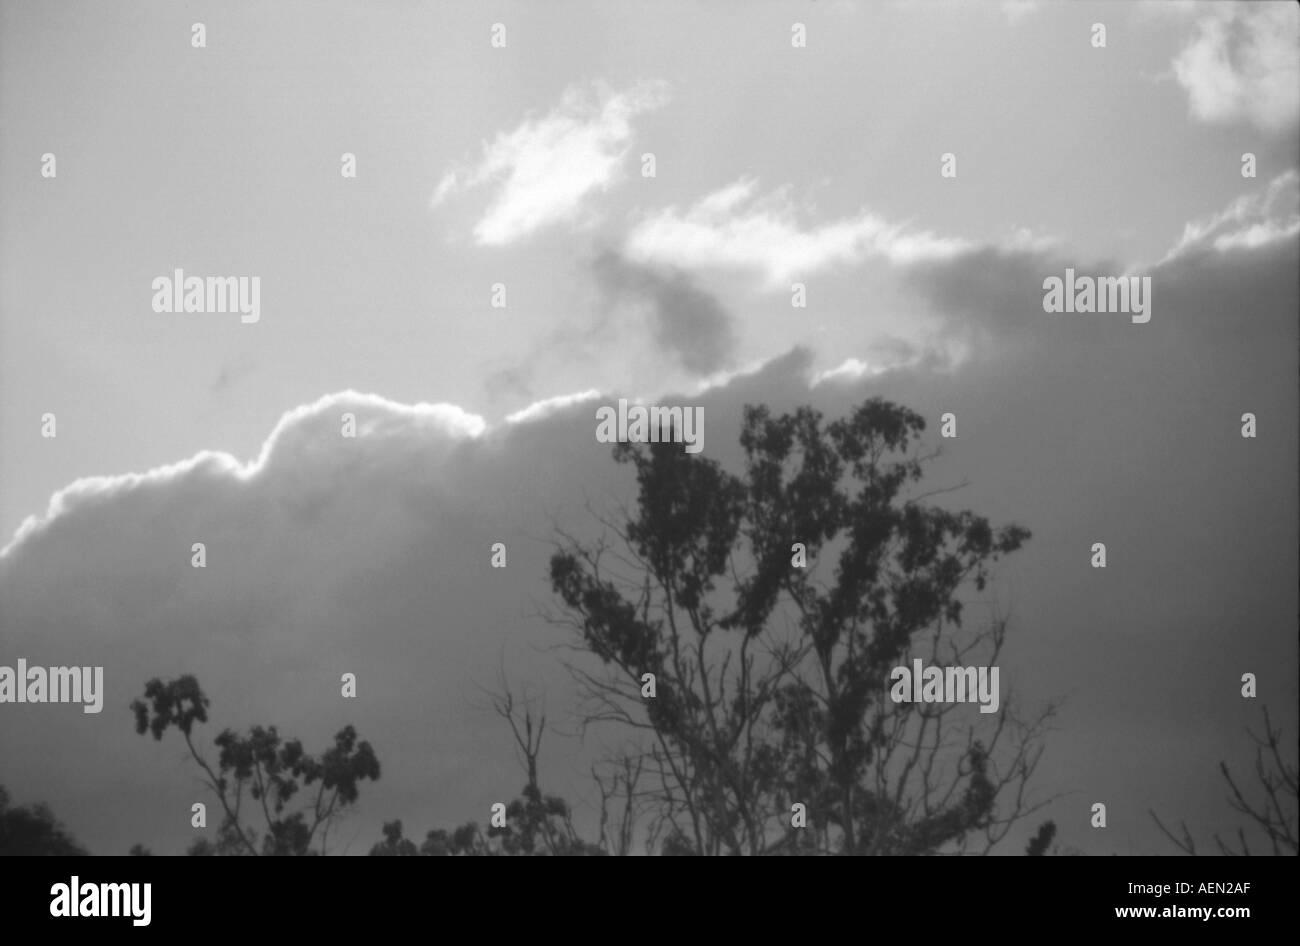 eucalyptus and clouds - Stock Image